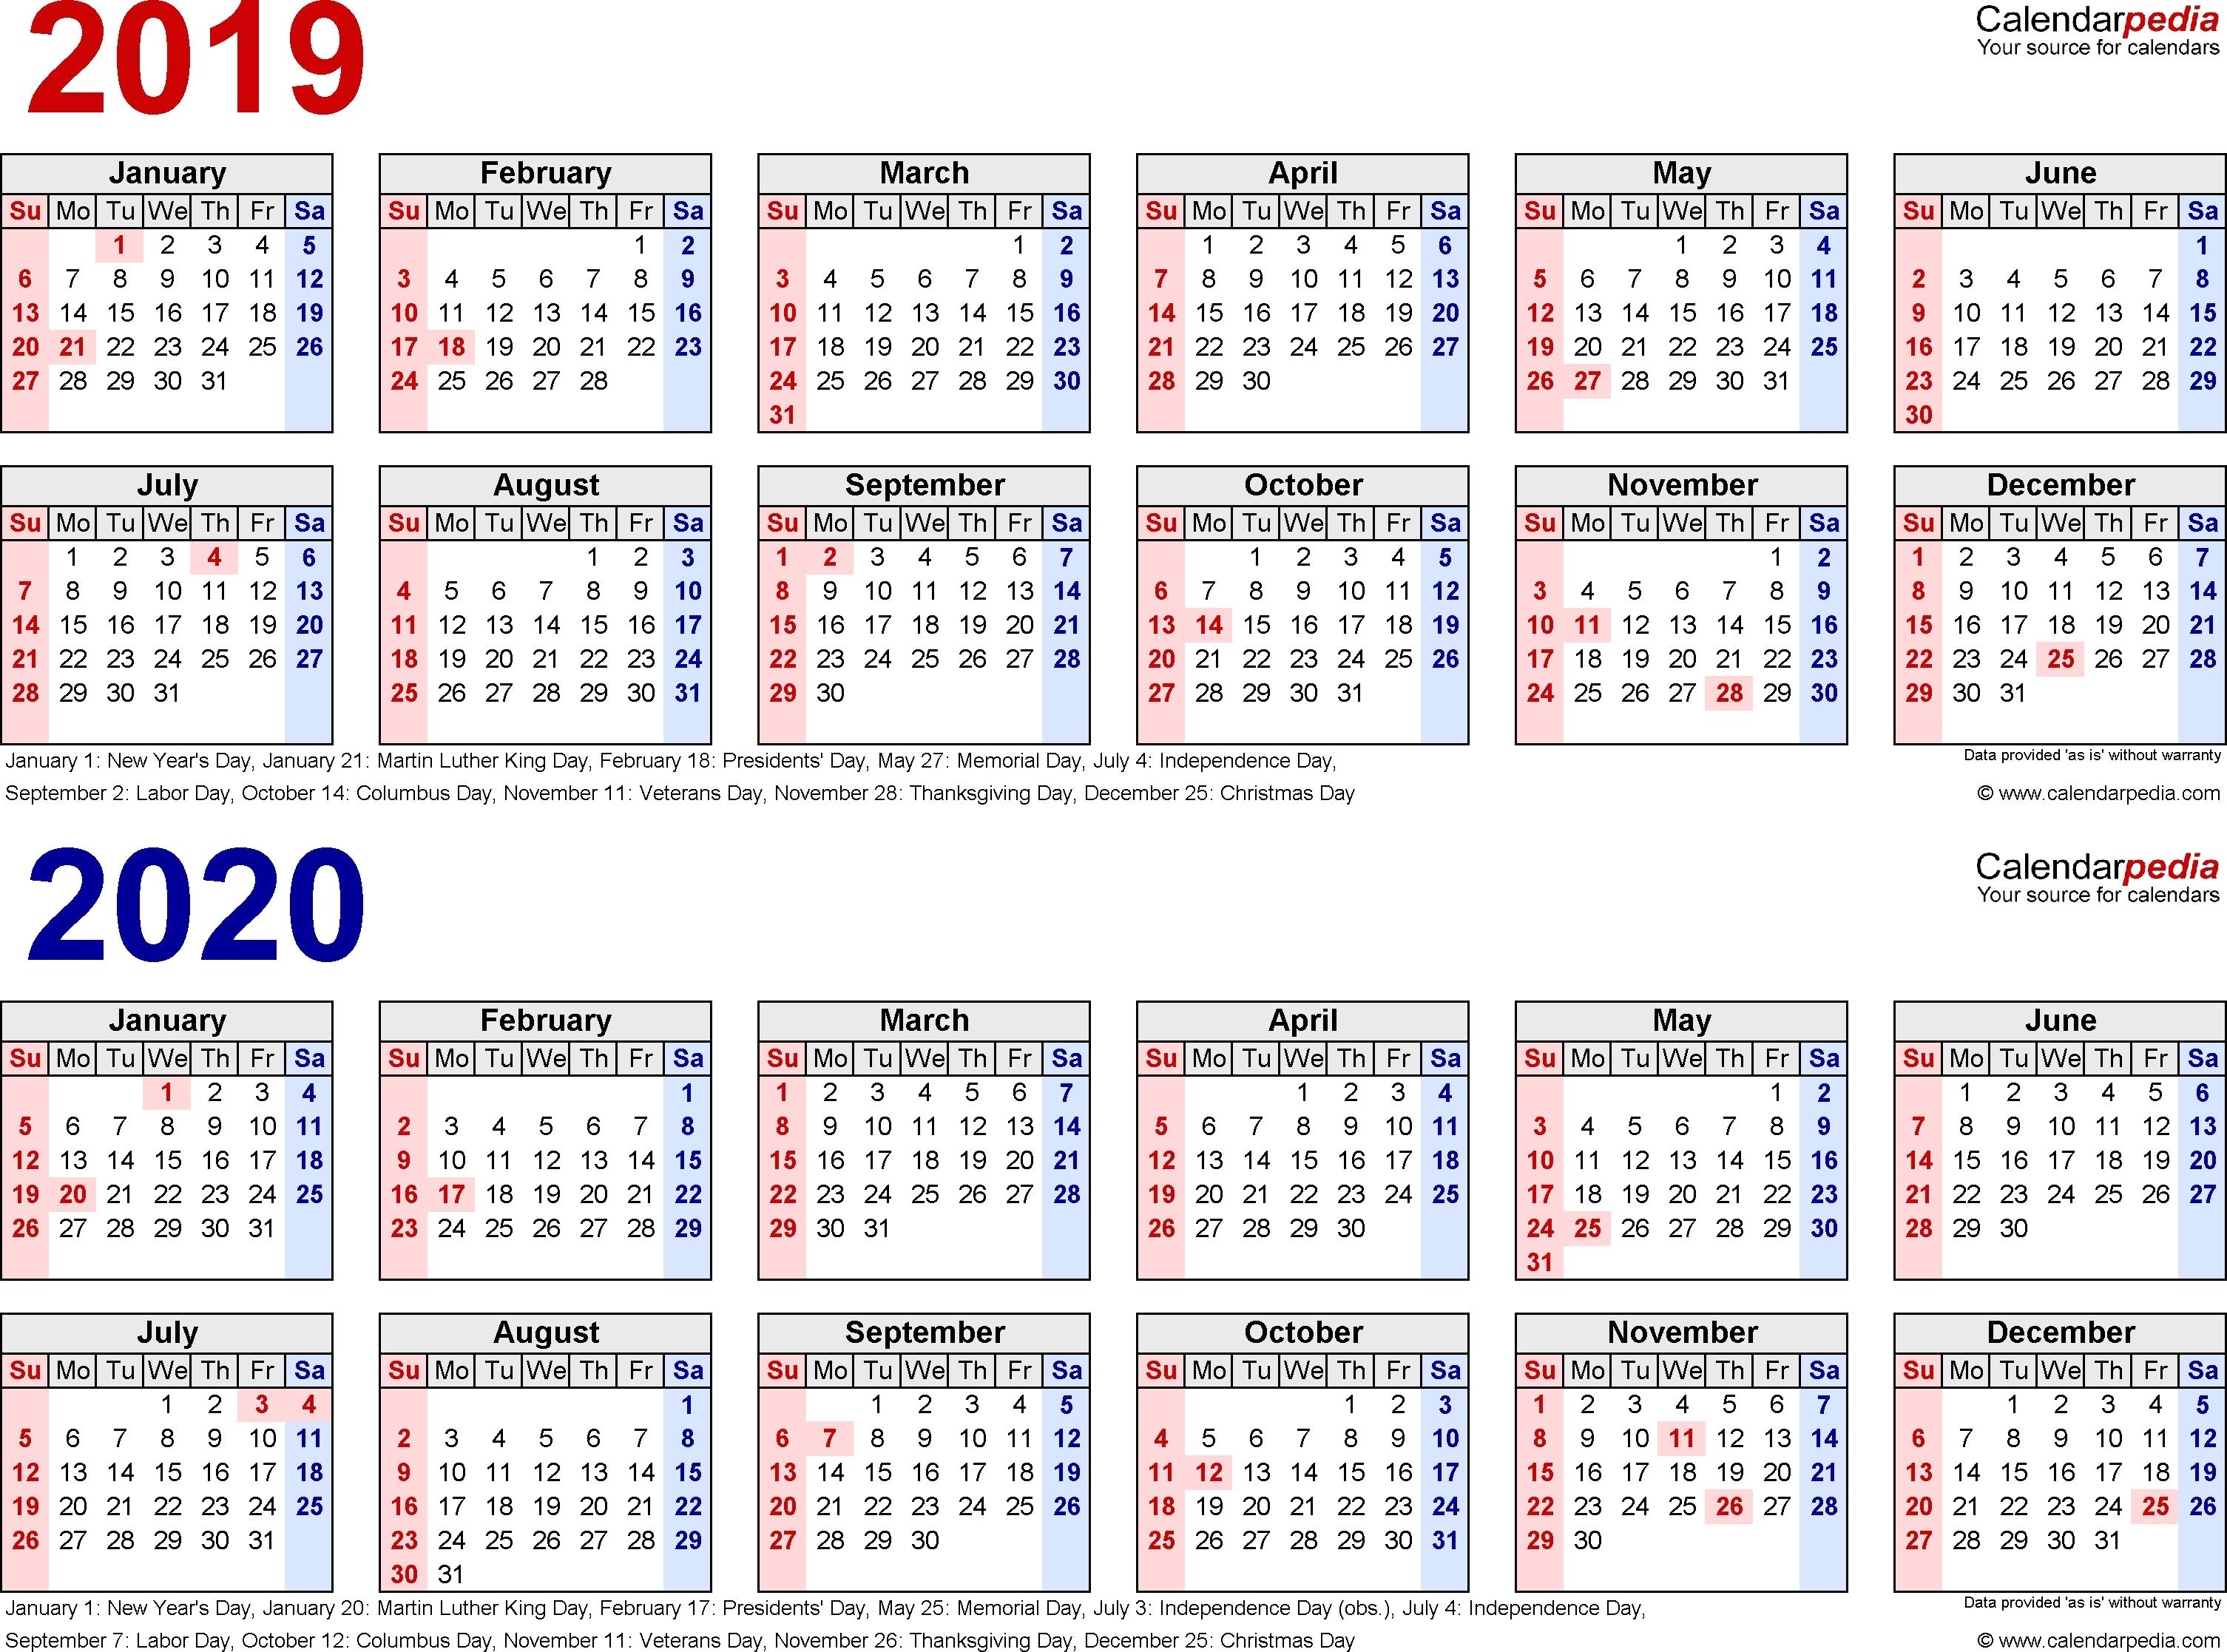 Incredible 2020 Calendar Time And Date • Printable Blank Calendar Calendar 2019 Time And Date